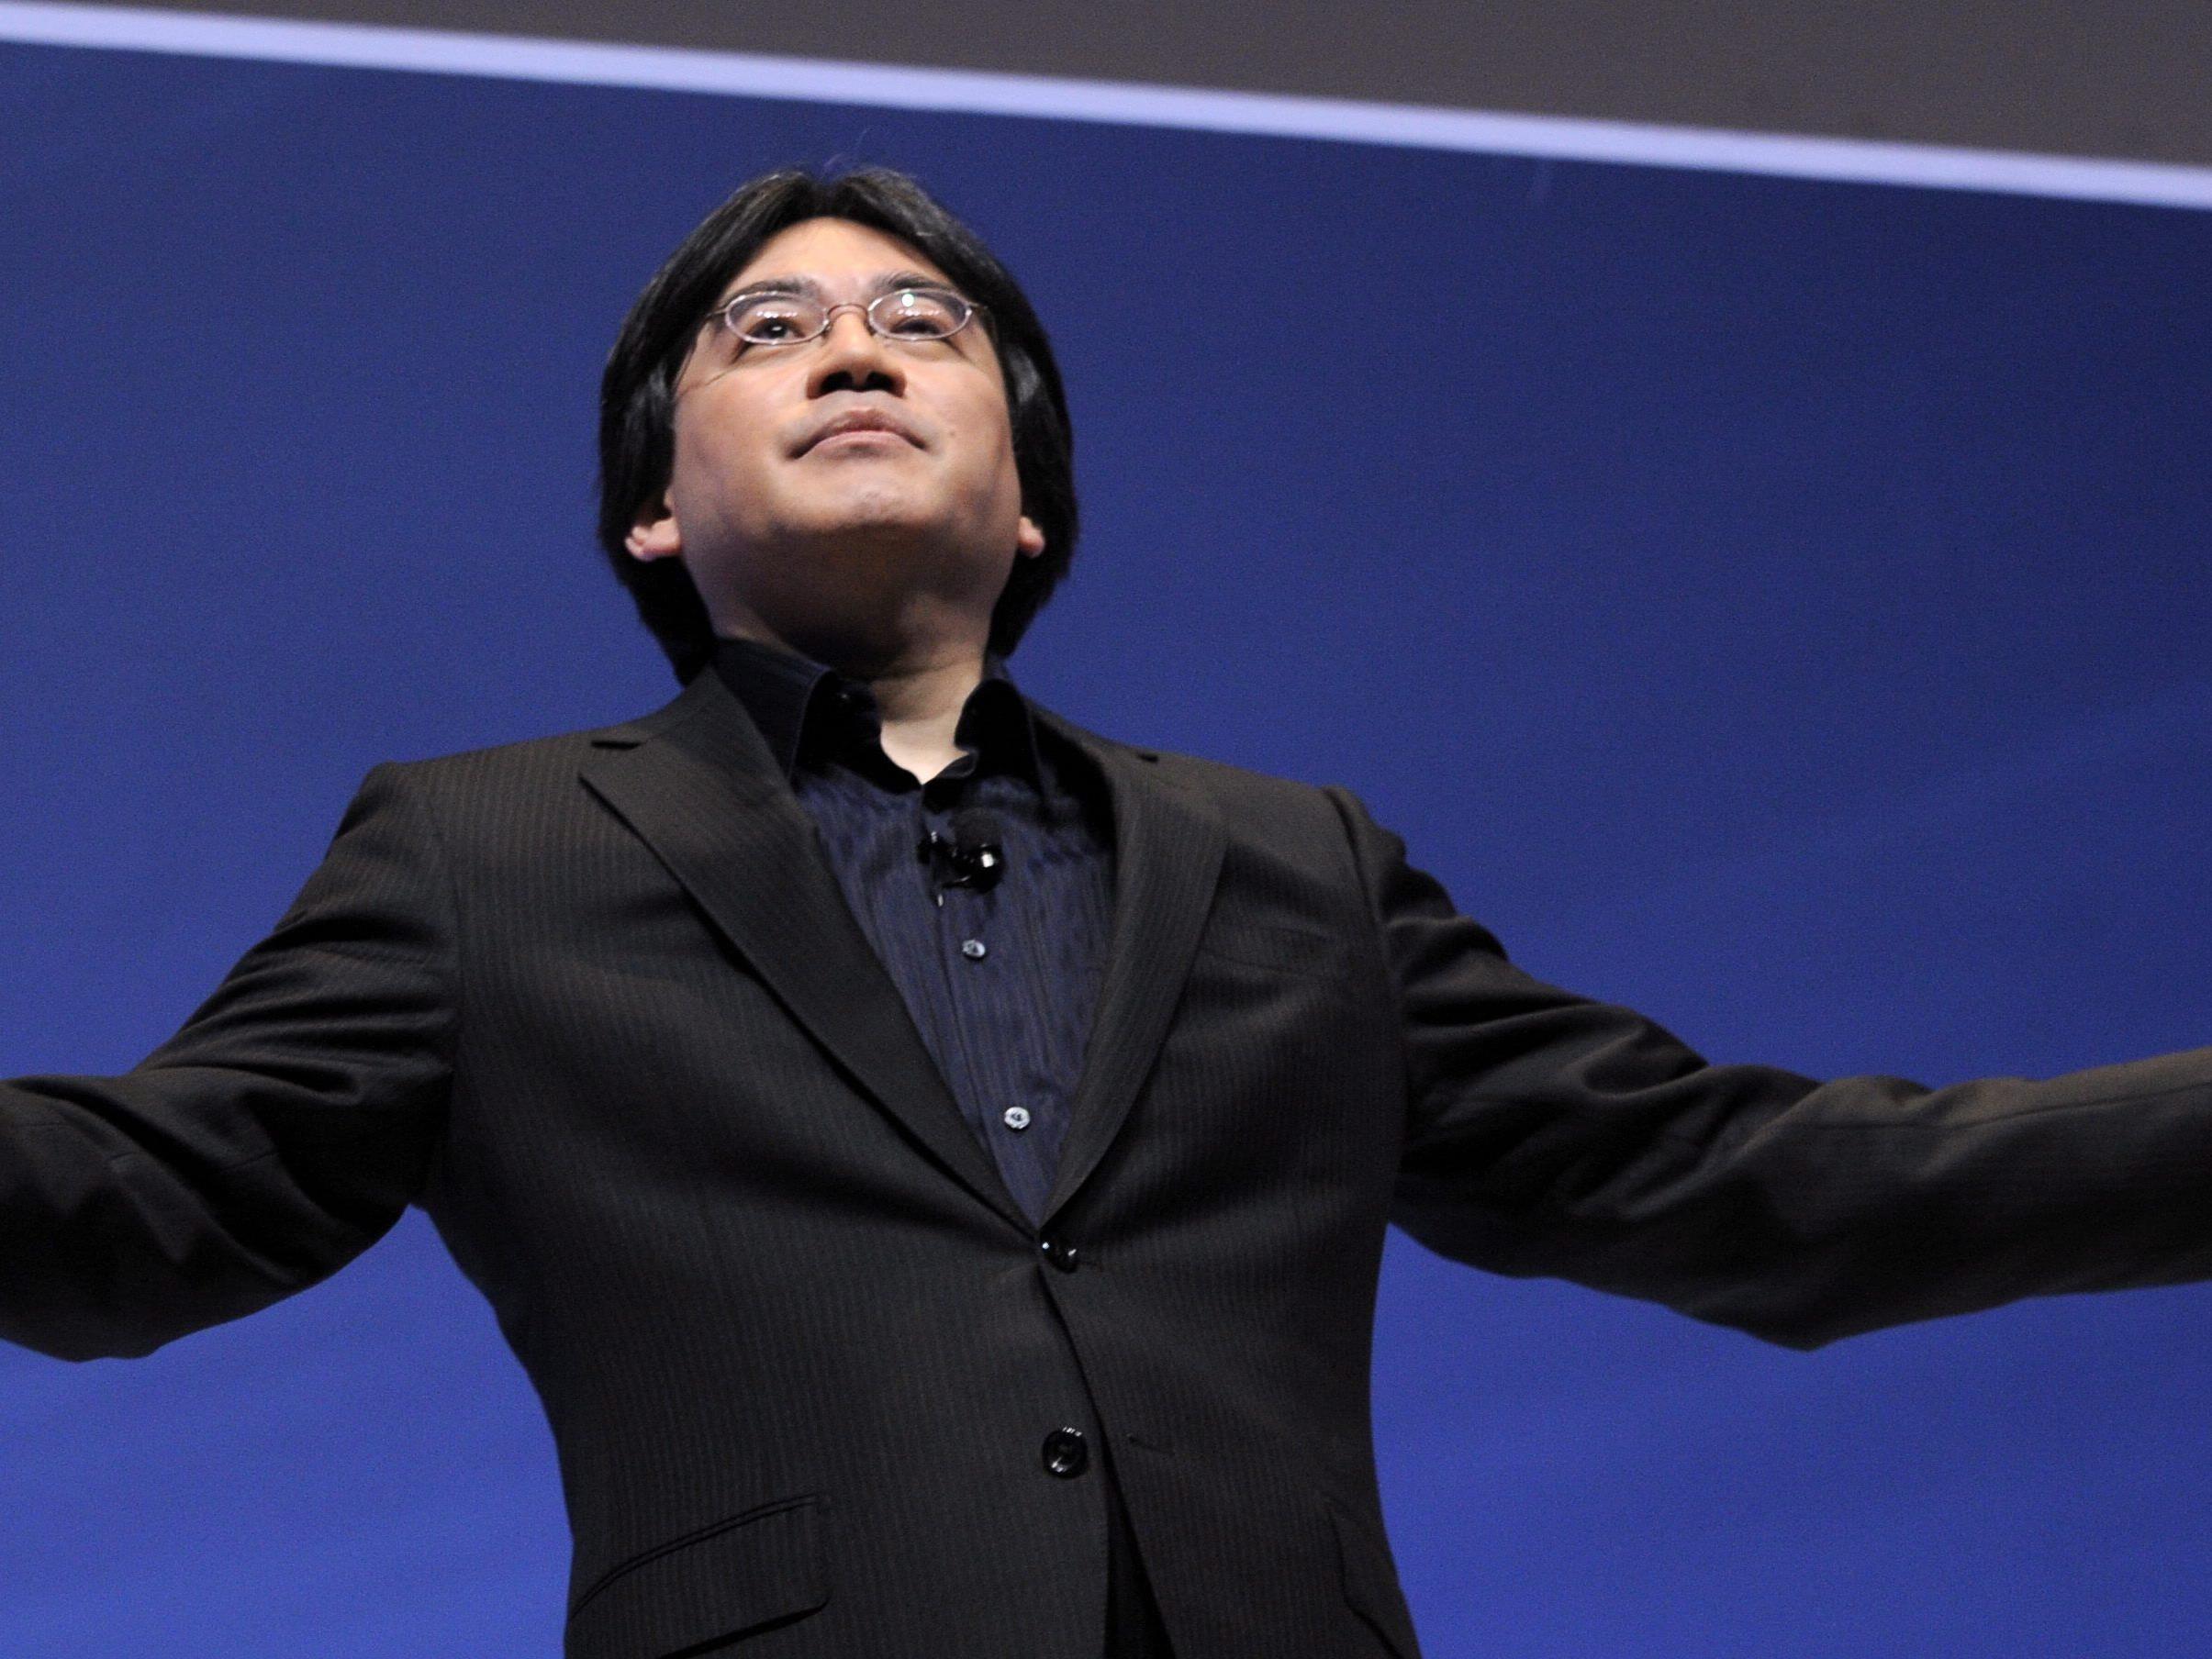 Nintendo-Chef Iwata gestorben